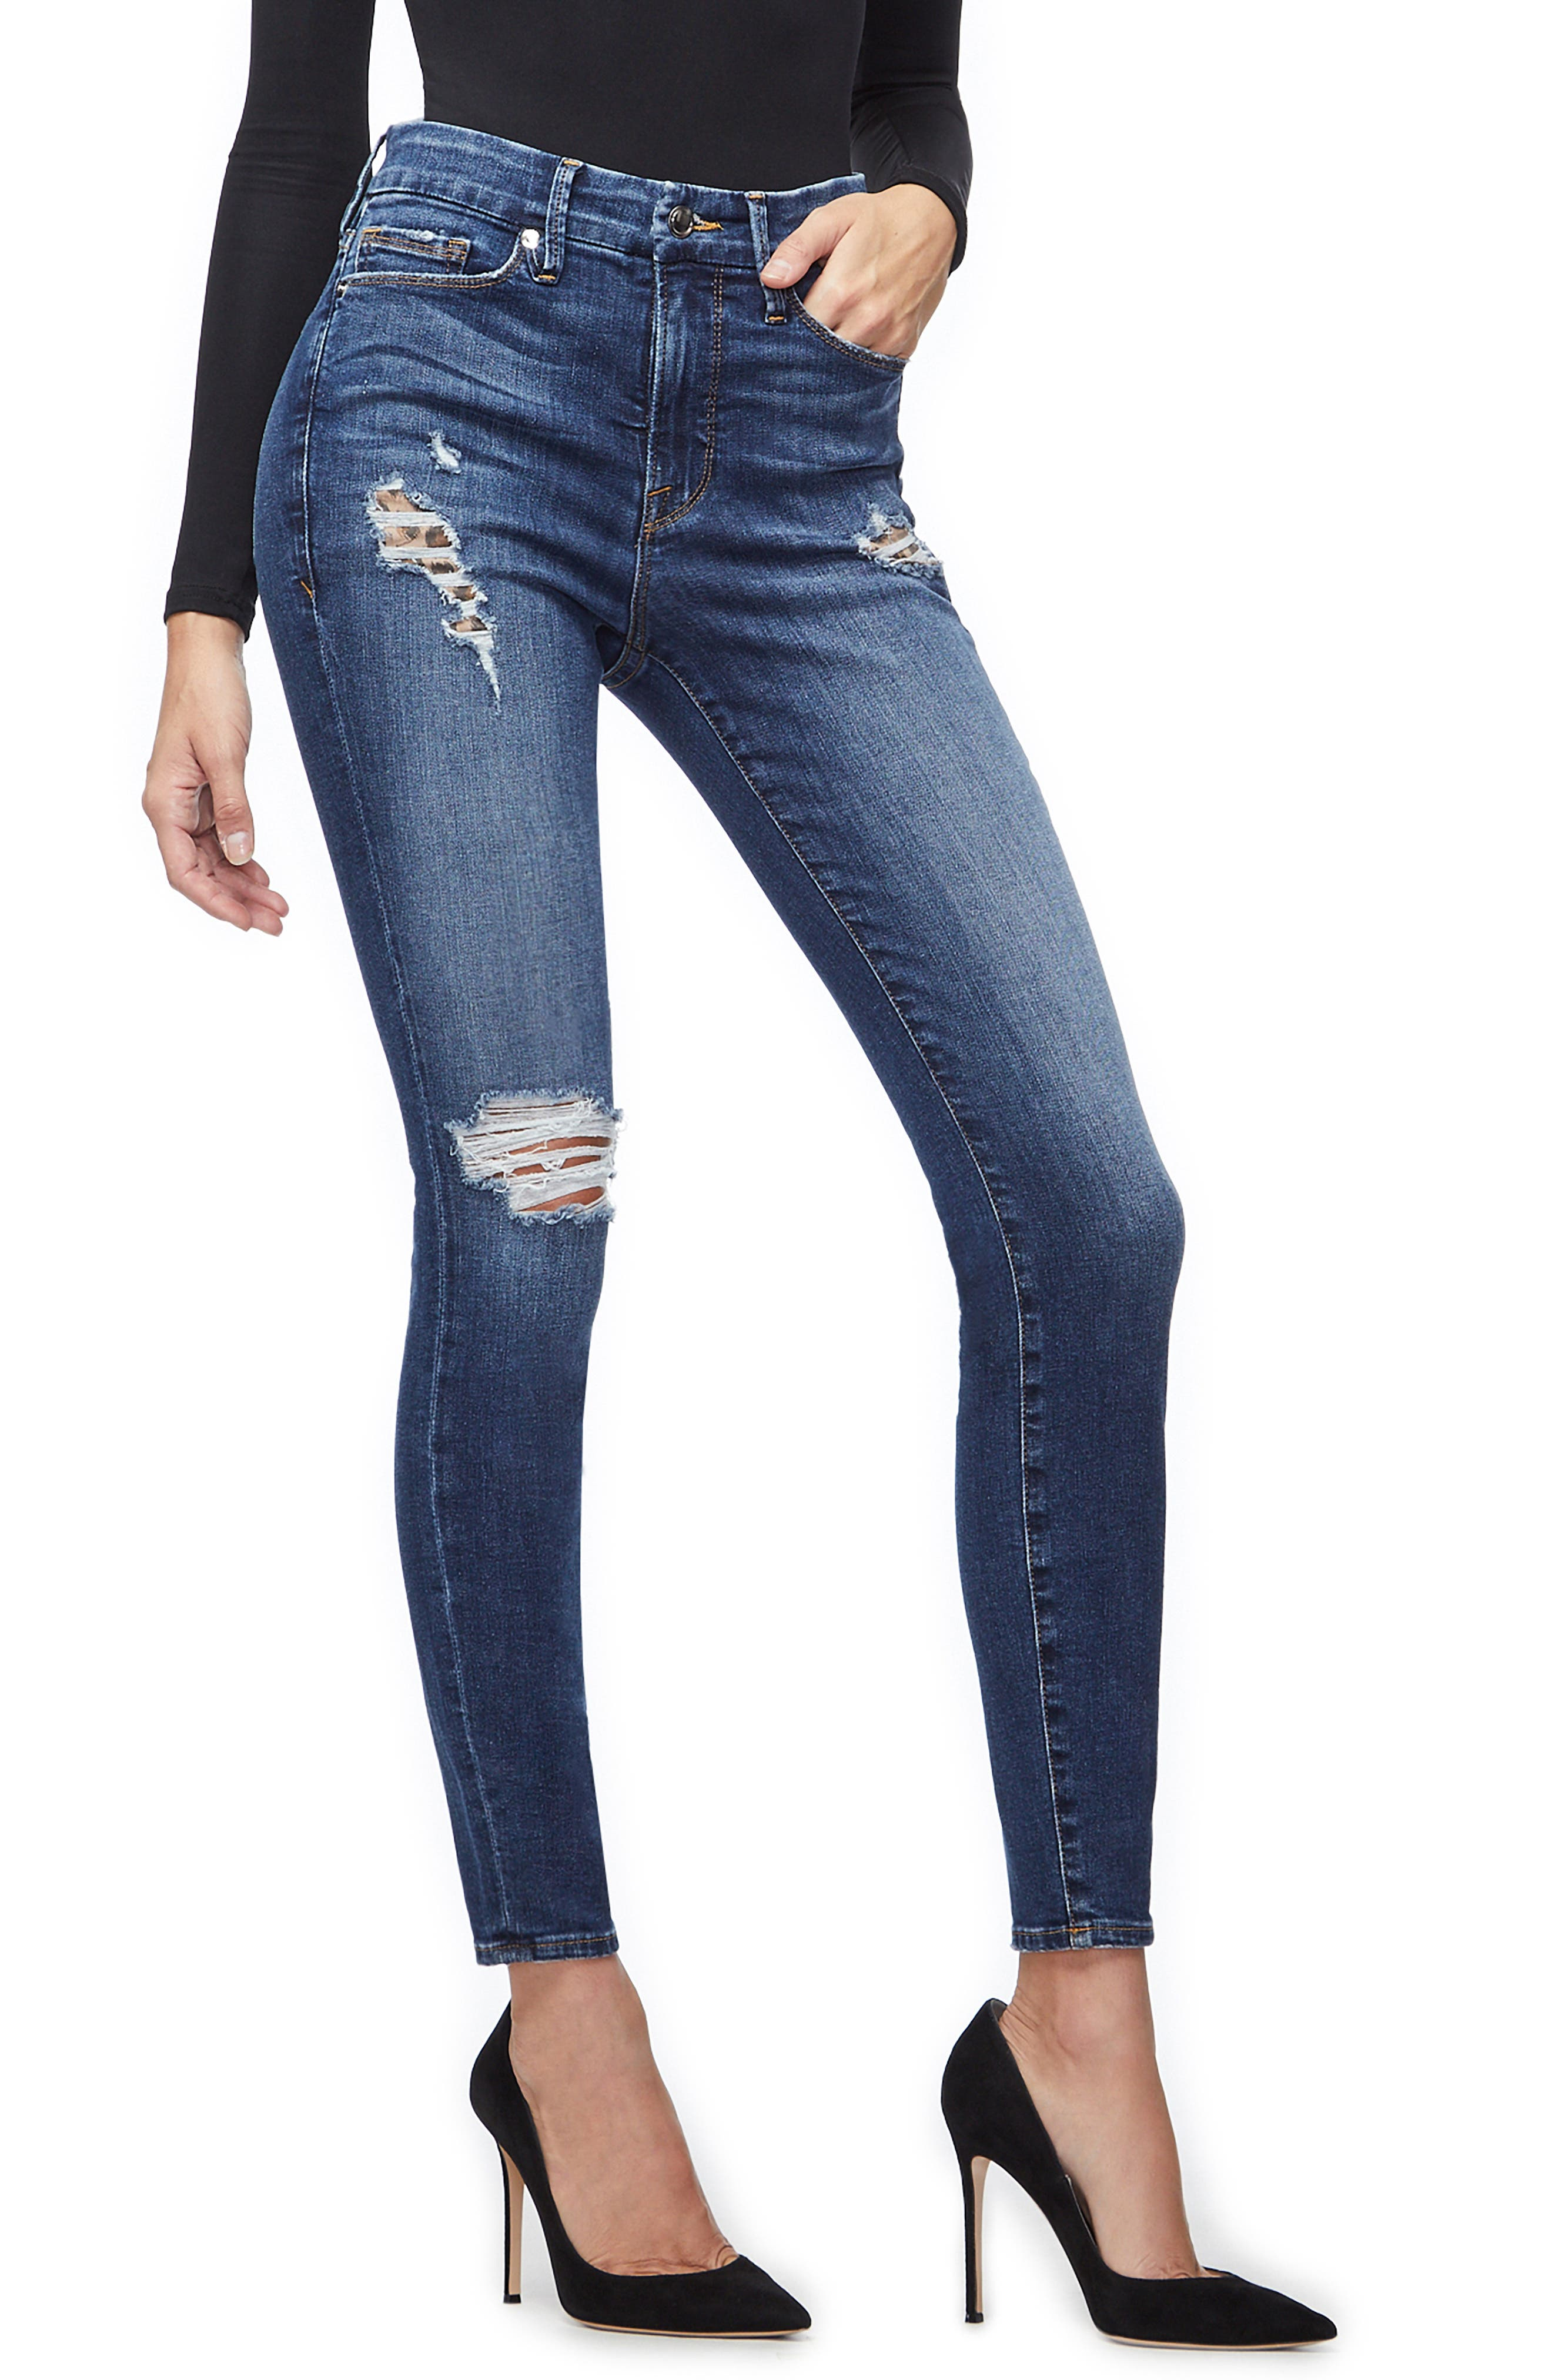 GOOD AMERICAN, Good Legs Cheetah Pockets High Waist Jeans, Alternate thumbnail 5, color, BLUE203